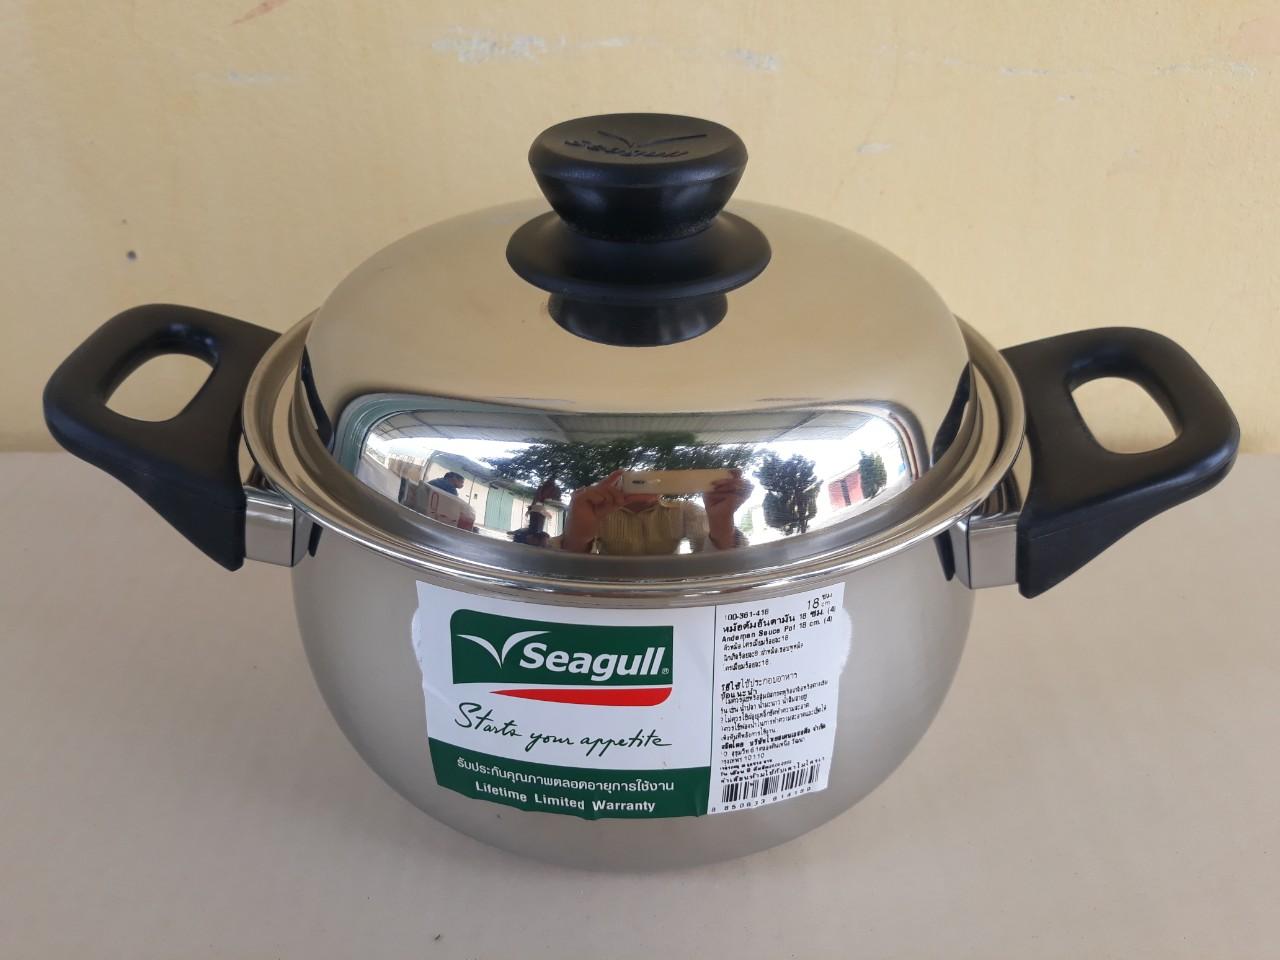 Nồi nấu canh seagull 18cm - 2.7 lít (Andaman) 100361418